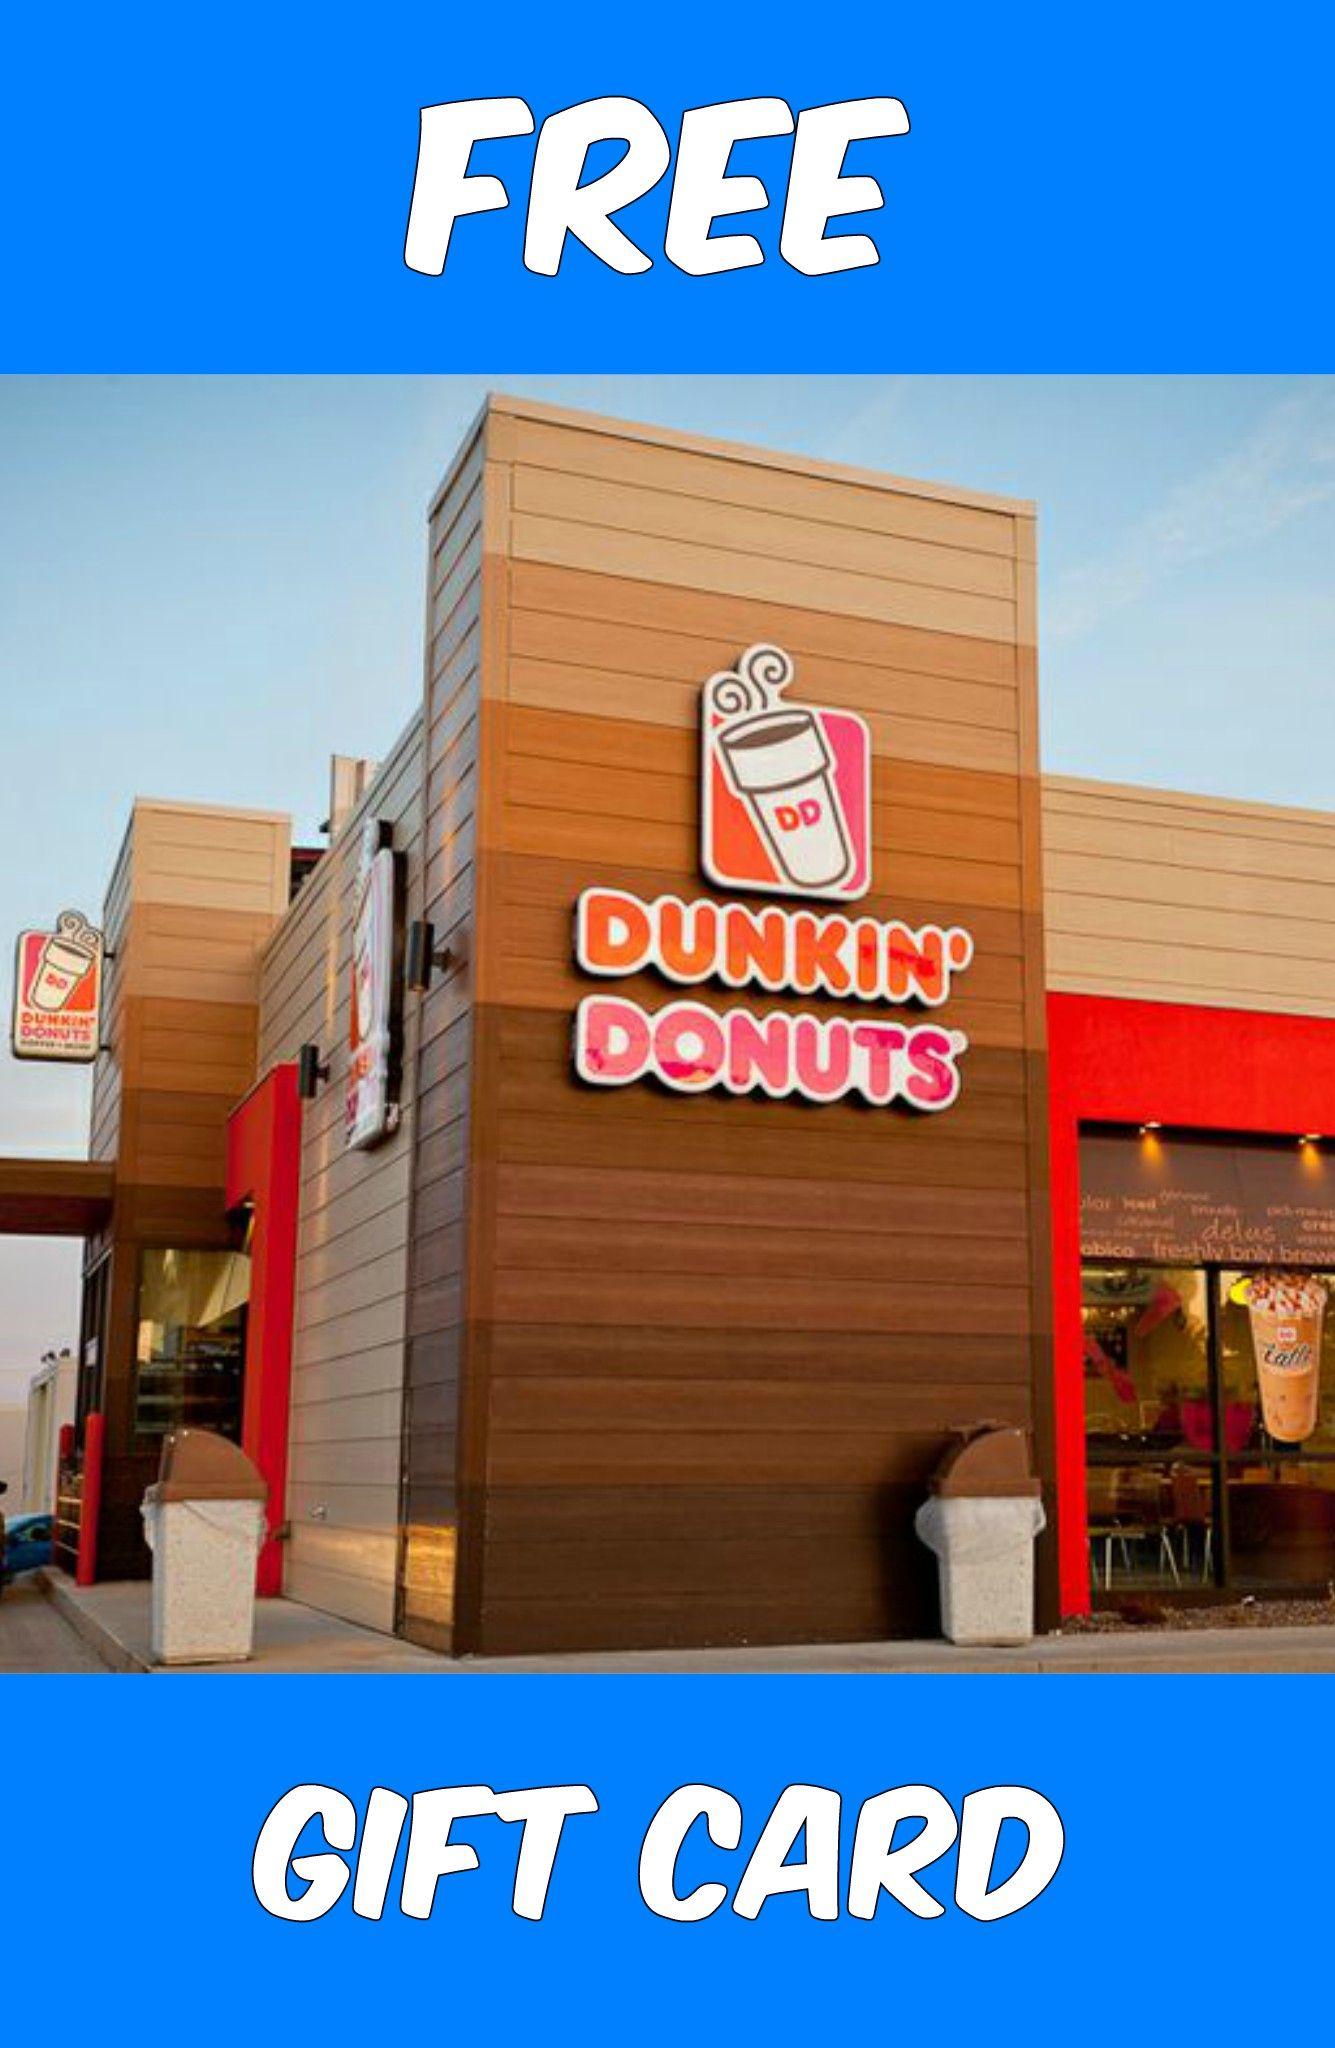 TMobile Tuesdays FREE Dunkin' Donuts Gift Card, Redbox